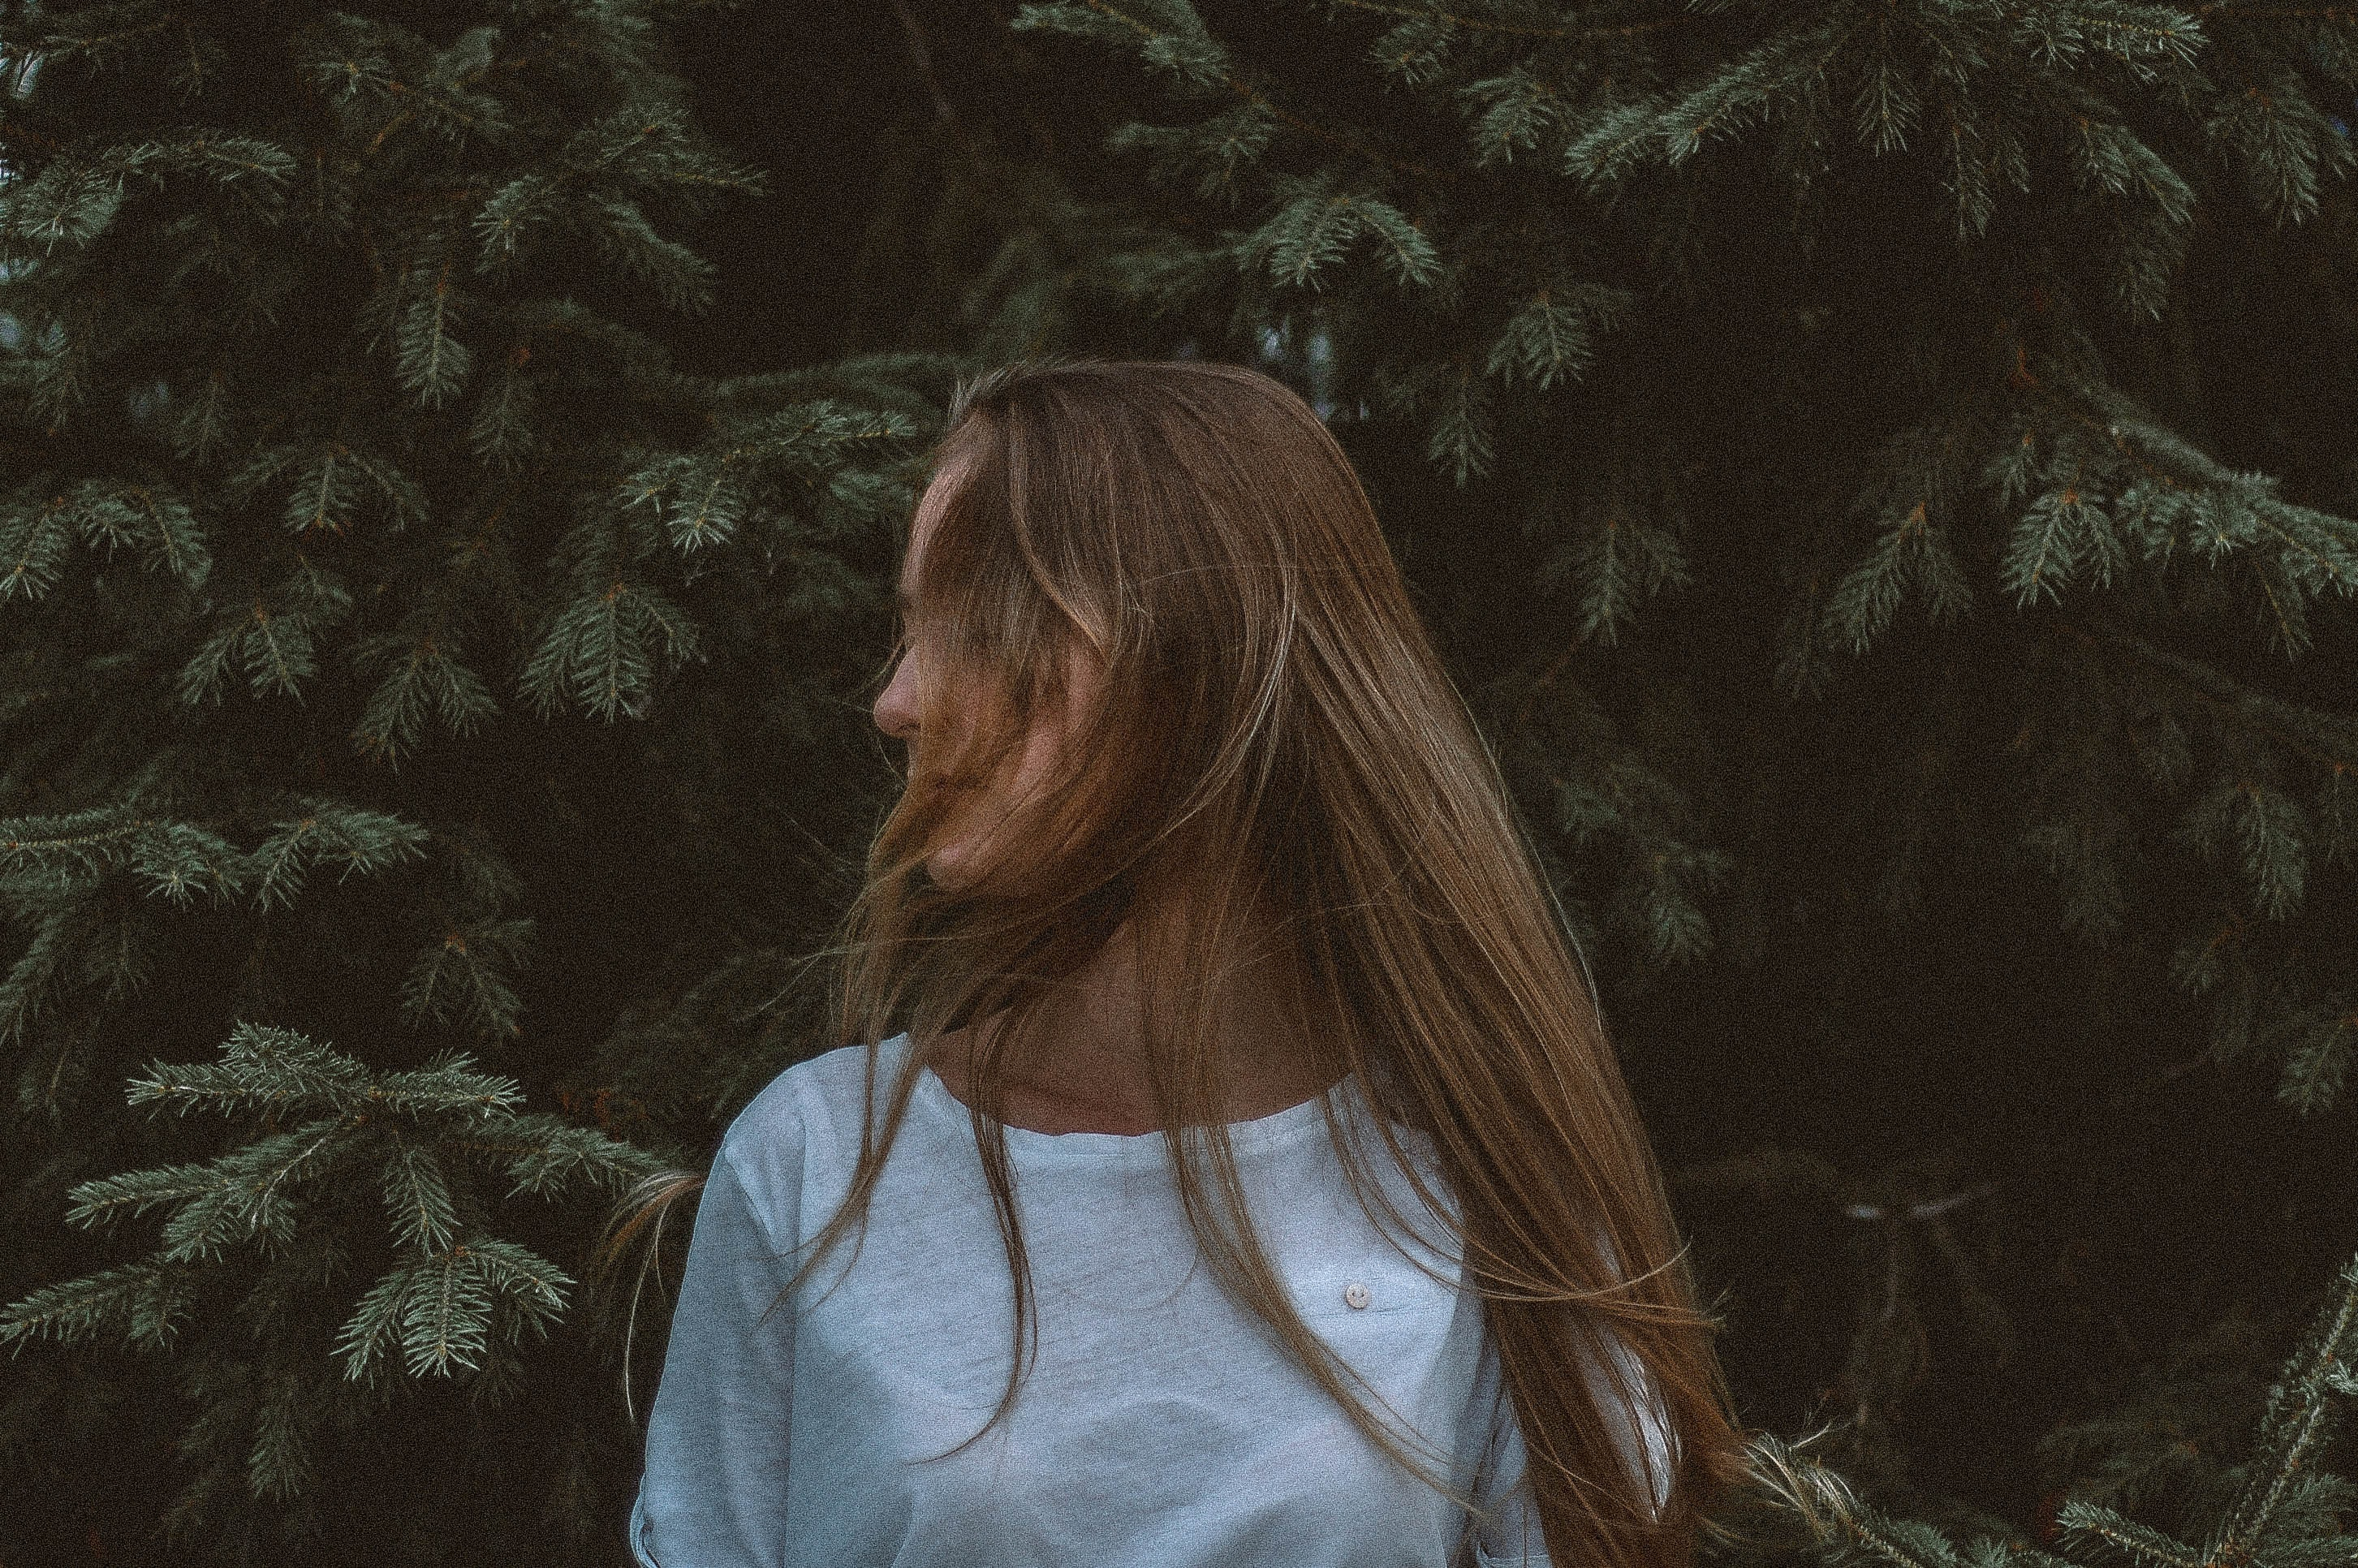 woman wearing white shirt near tree